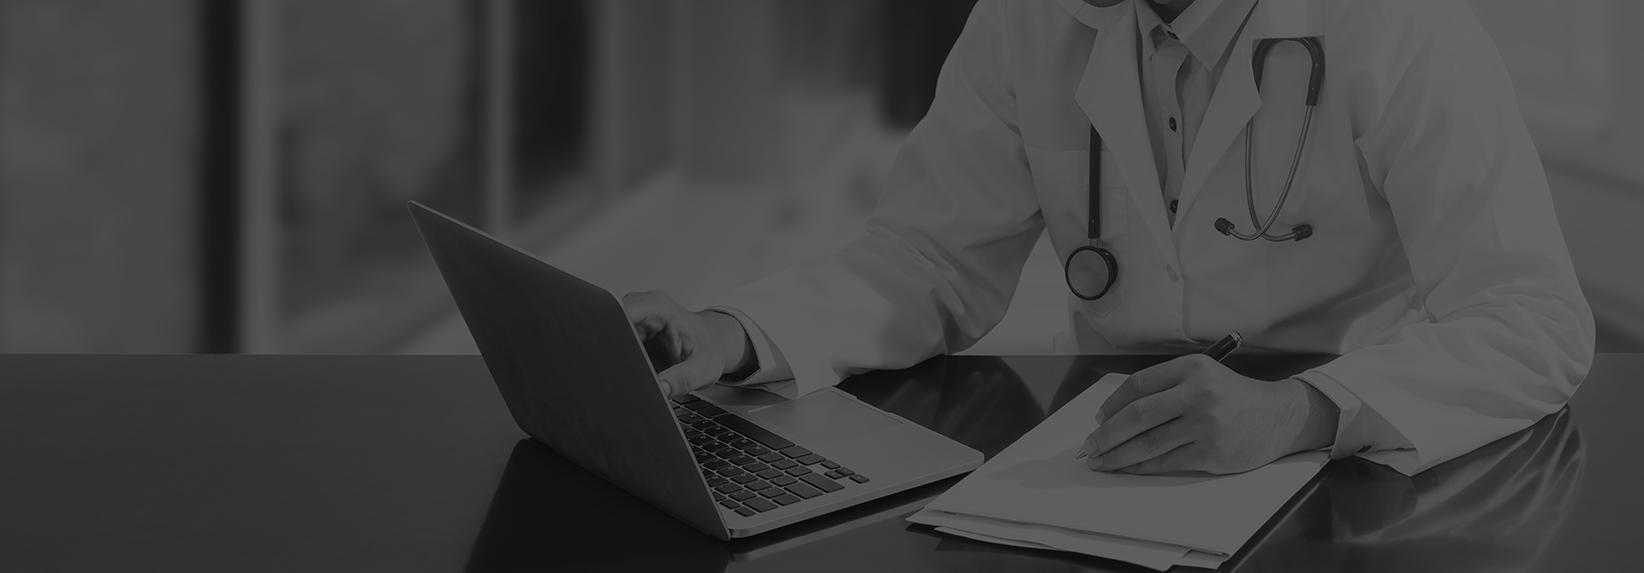 UMass Memorial Health Care Migrates Disparate Medical Data onto New Storage Infrastructure